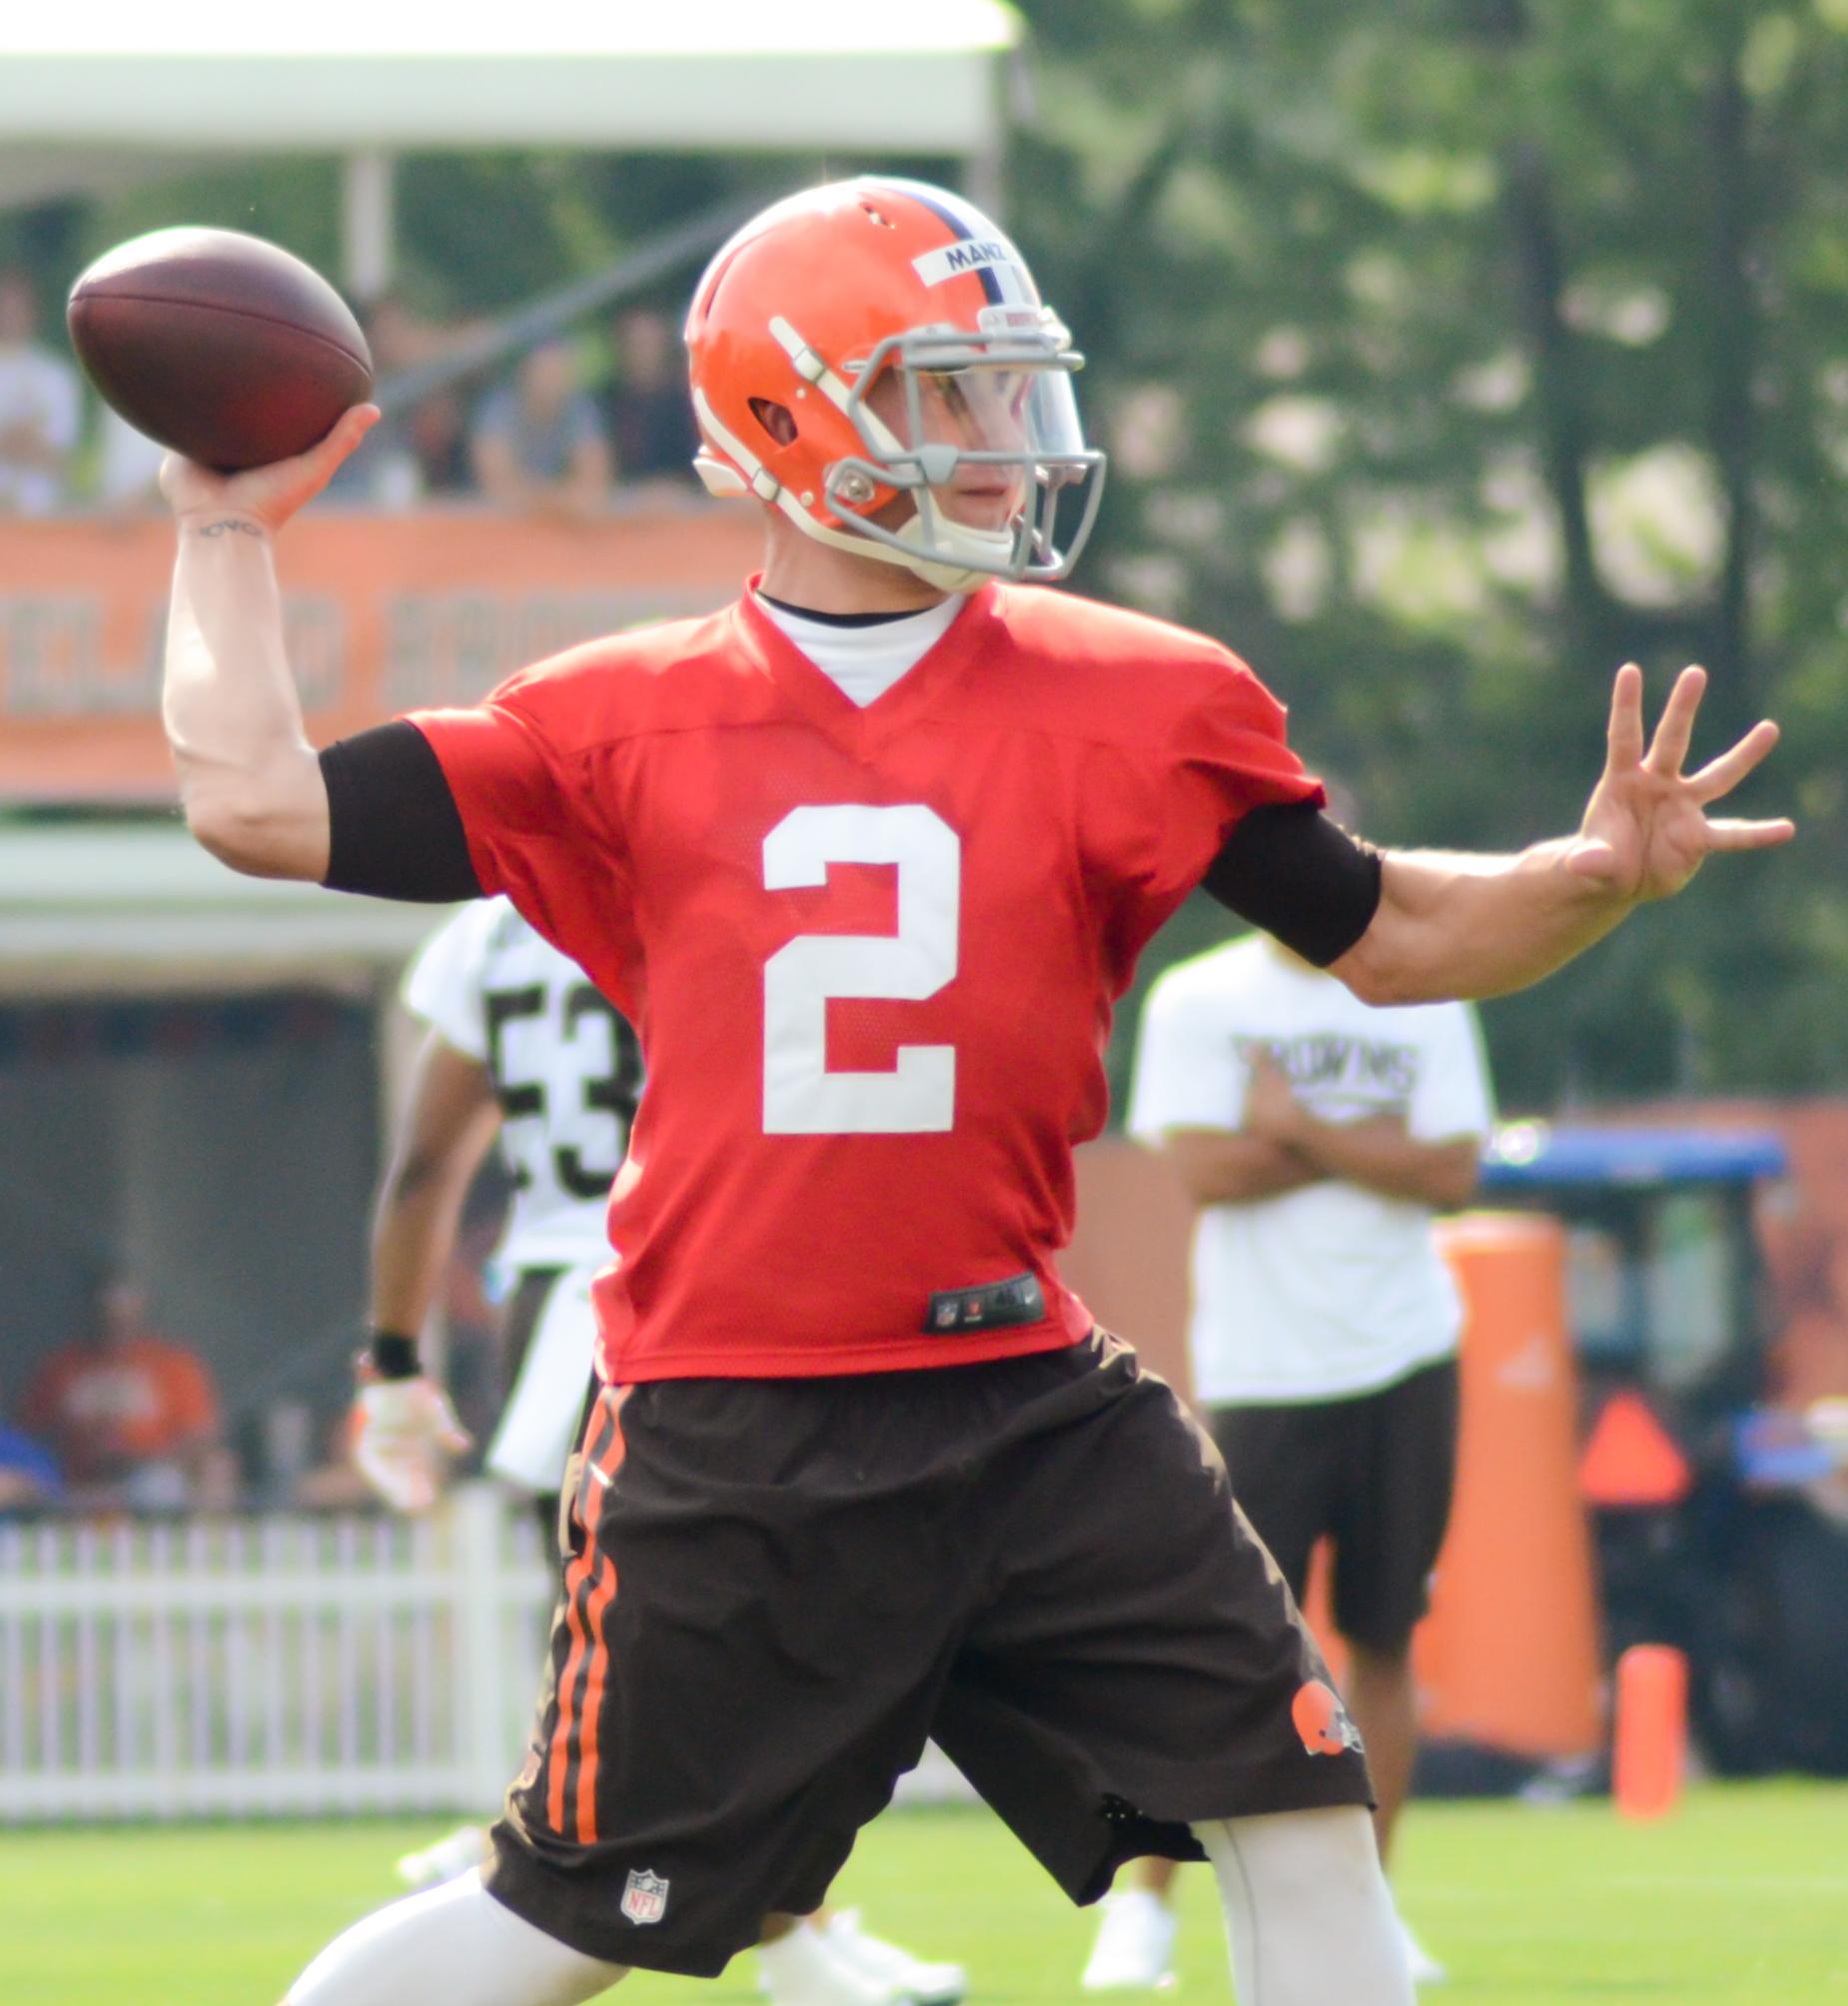 Johnny_Manziel_2014_Browns_training_camp_(2).jpg